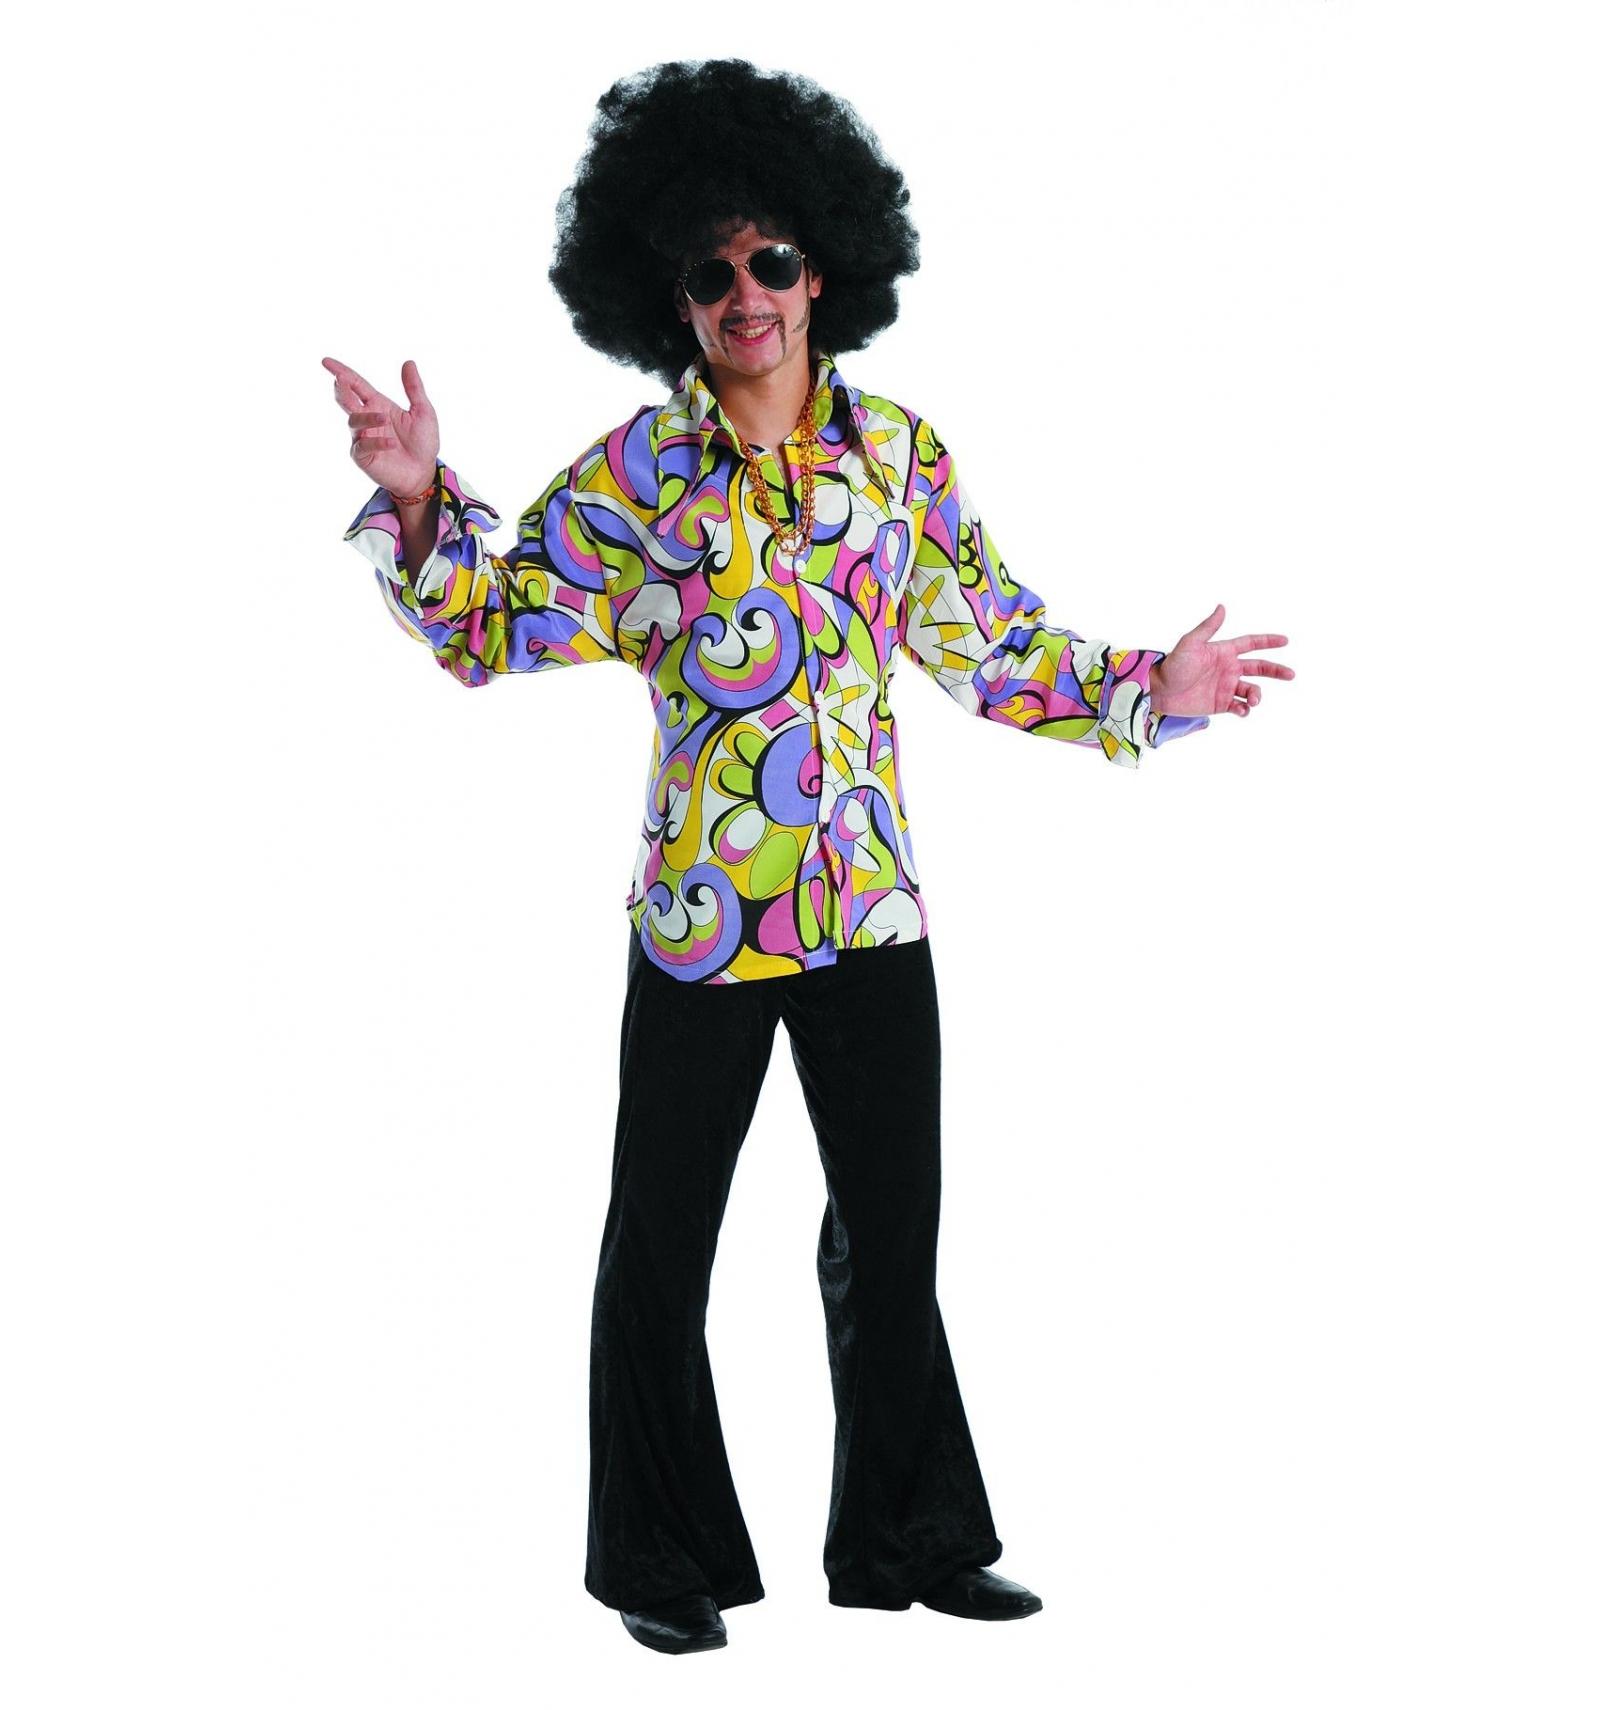 D guisement hippie ann es 70 homme t xxl votre magasin - Hippie annee 70 ...